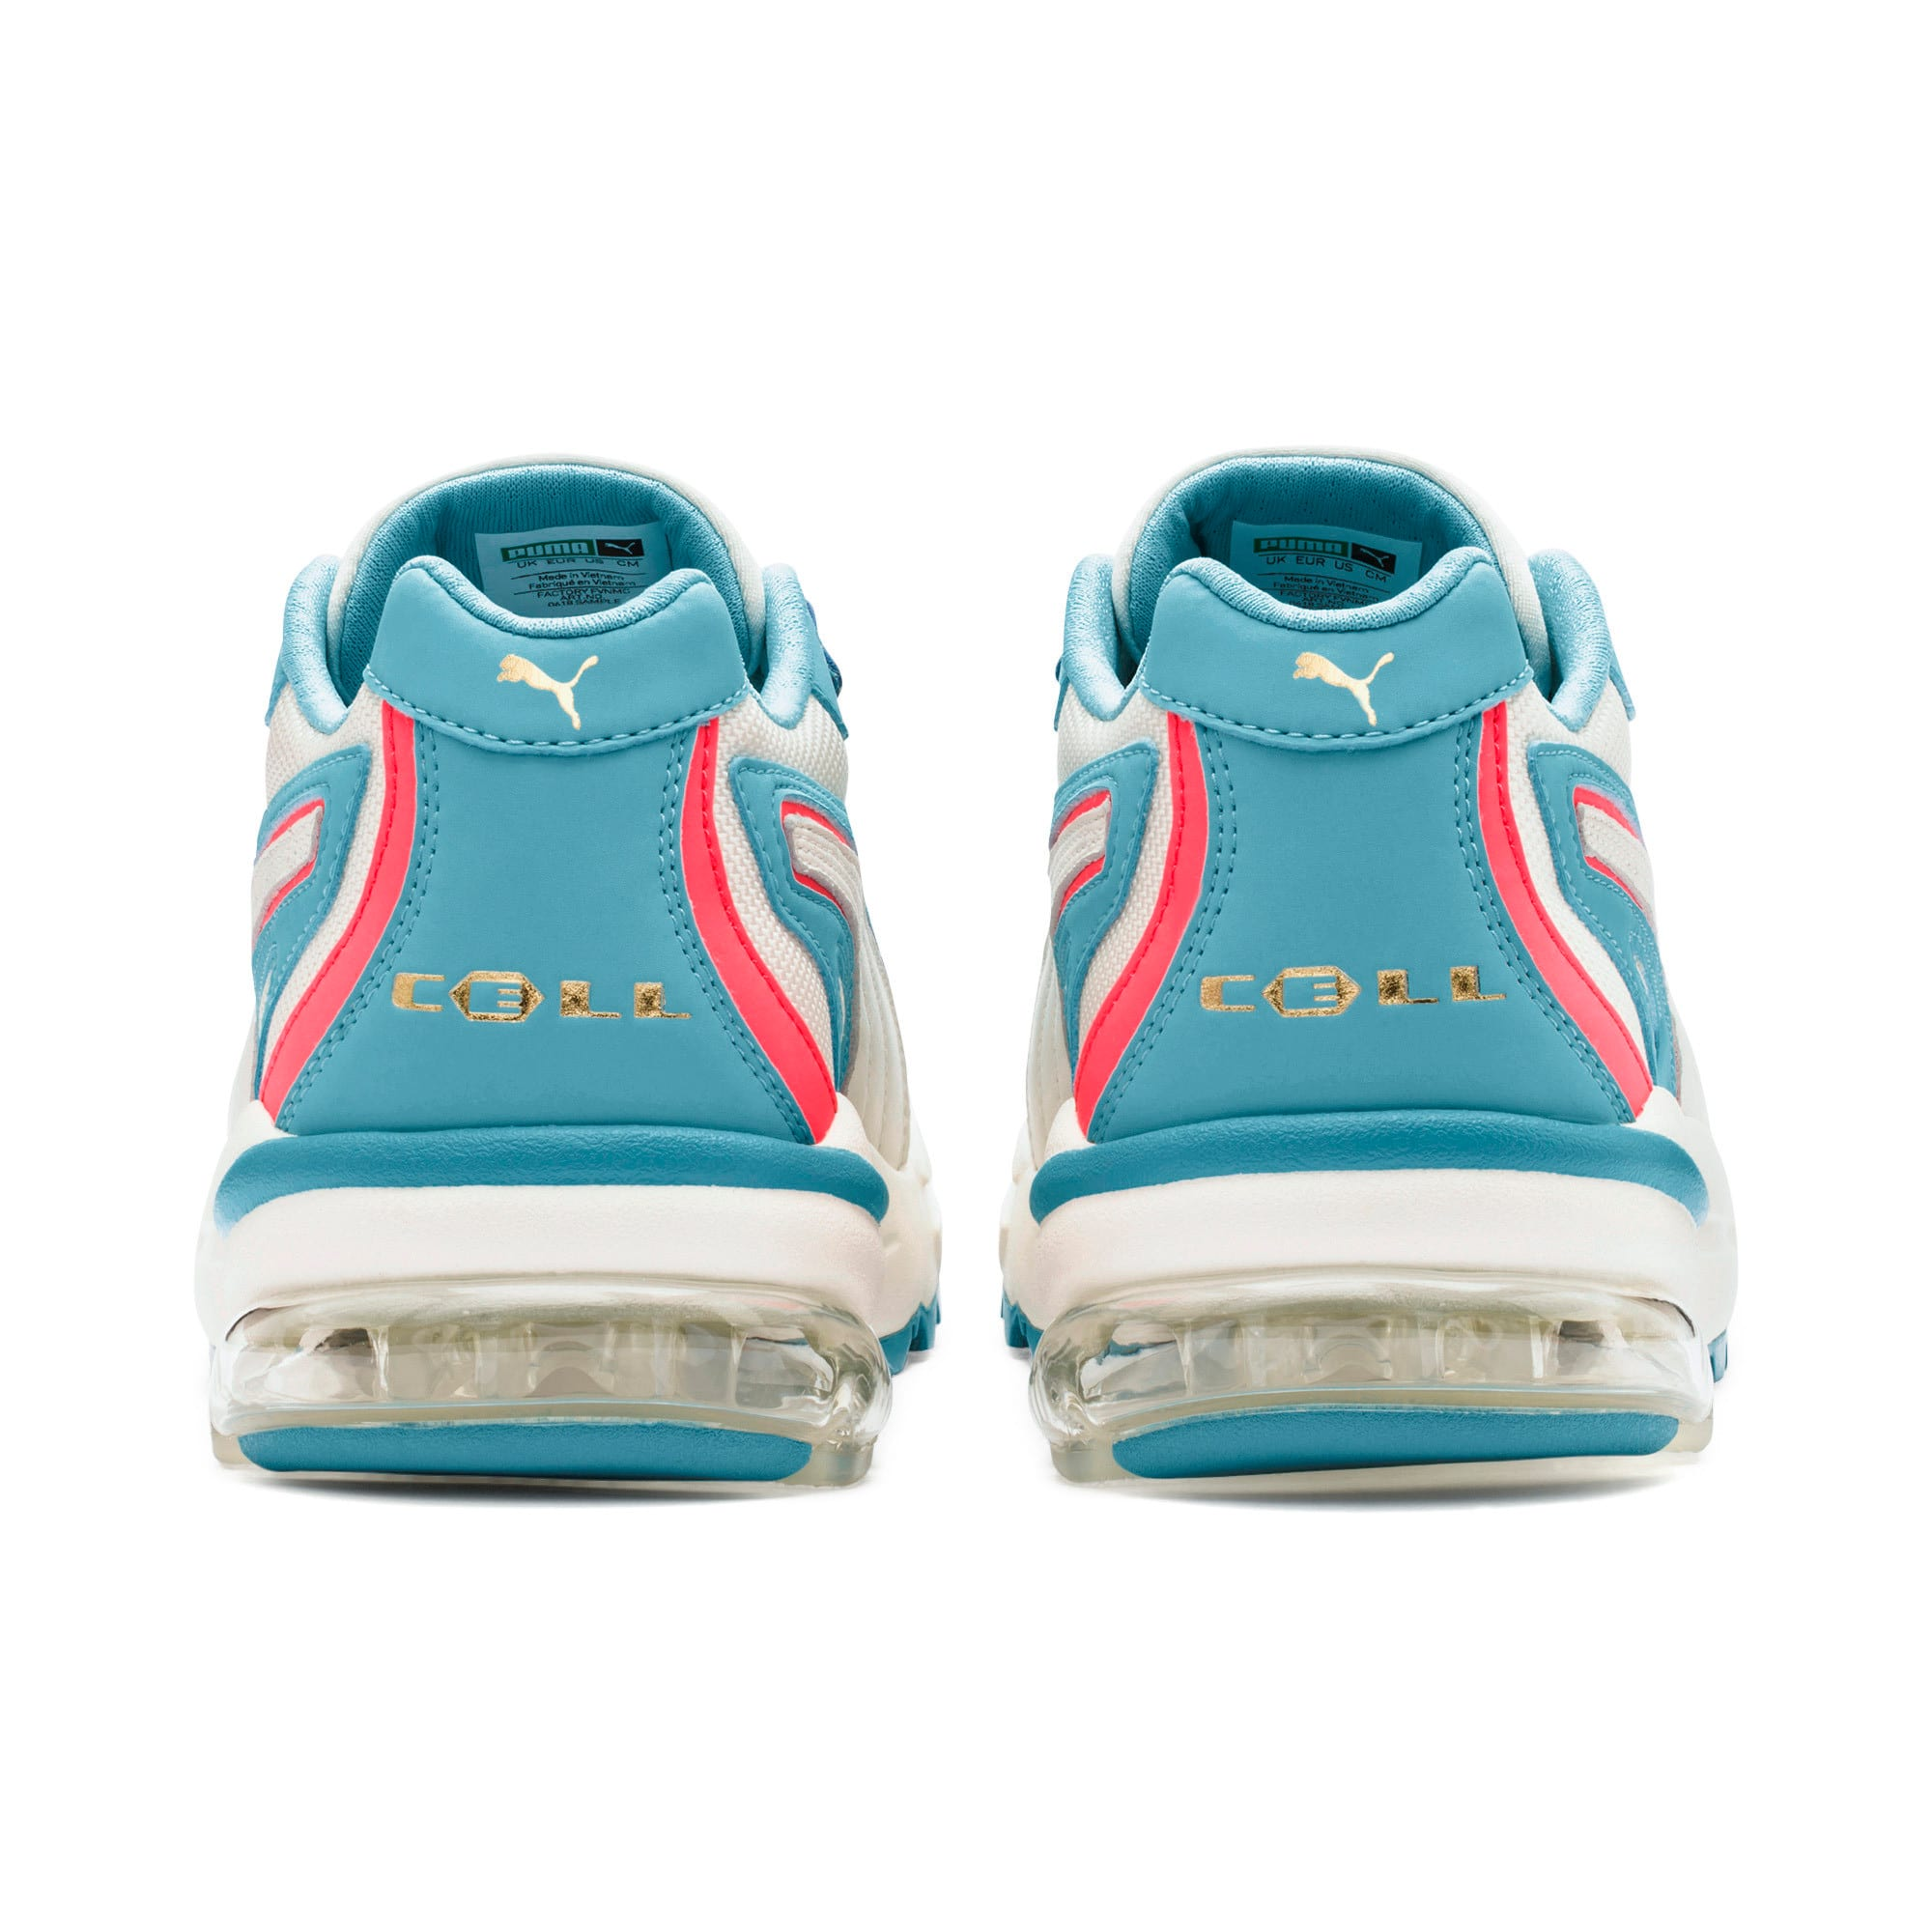 Thumbnail 4 of CELL Stellar Damen Sneaker, Milky Blue-Puma Team Gold, medium